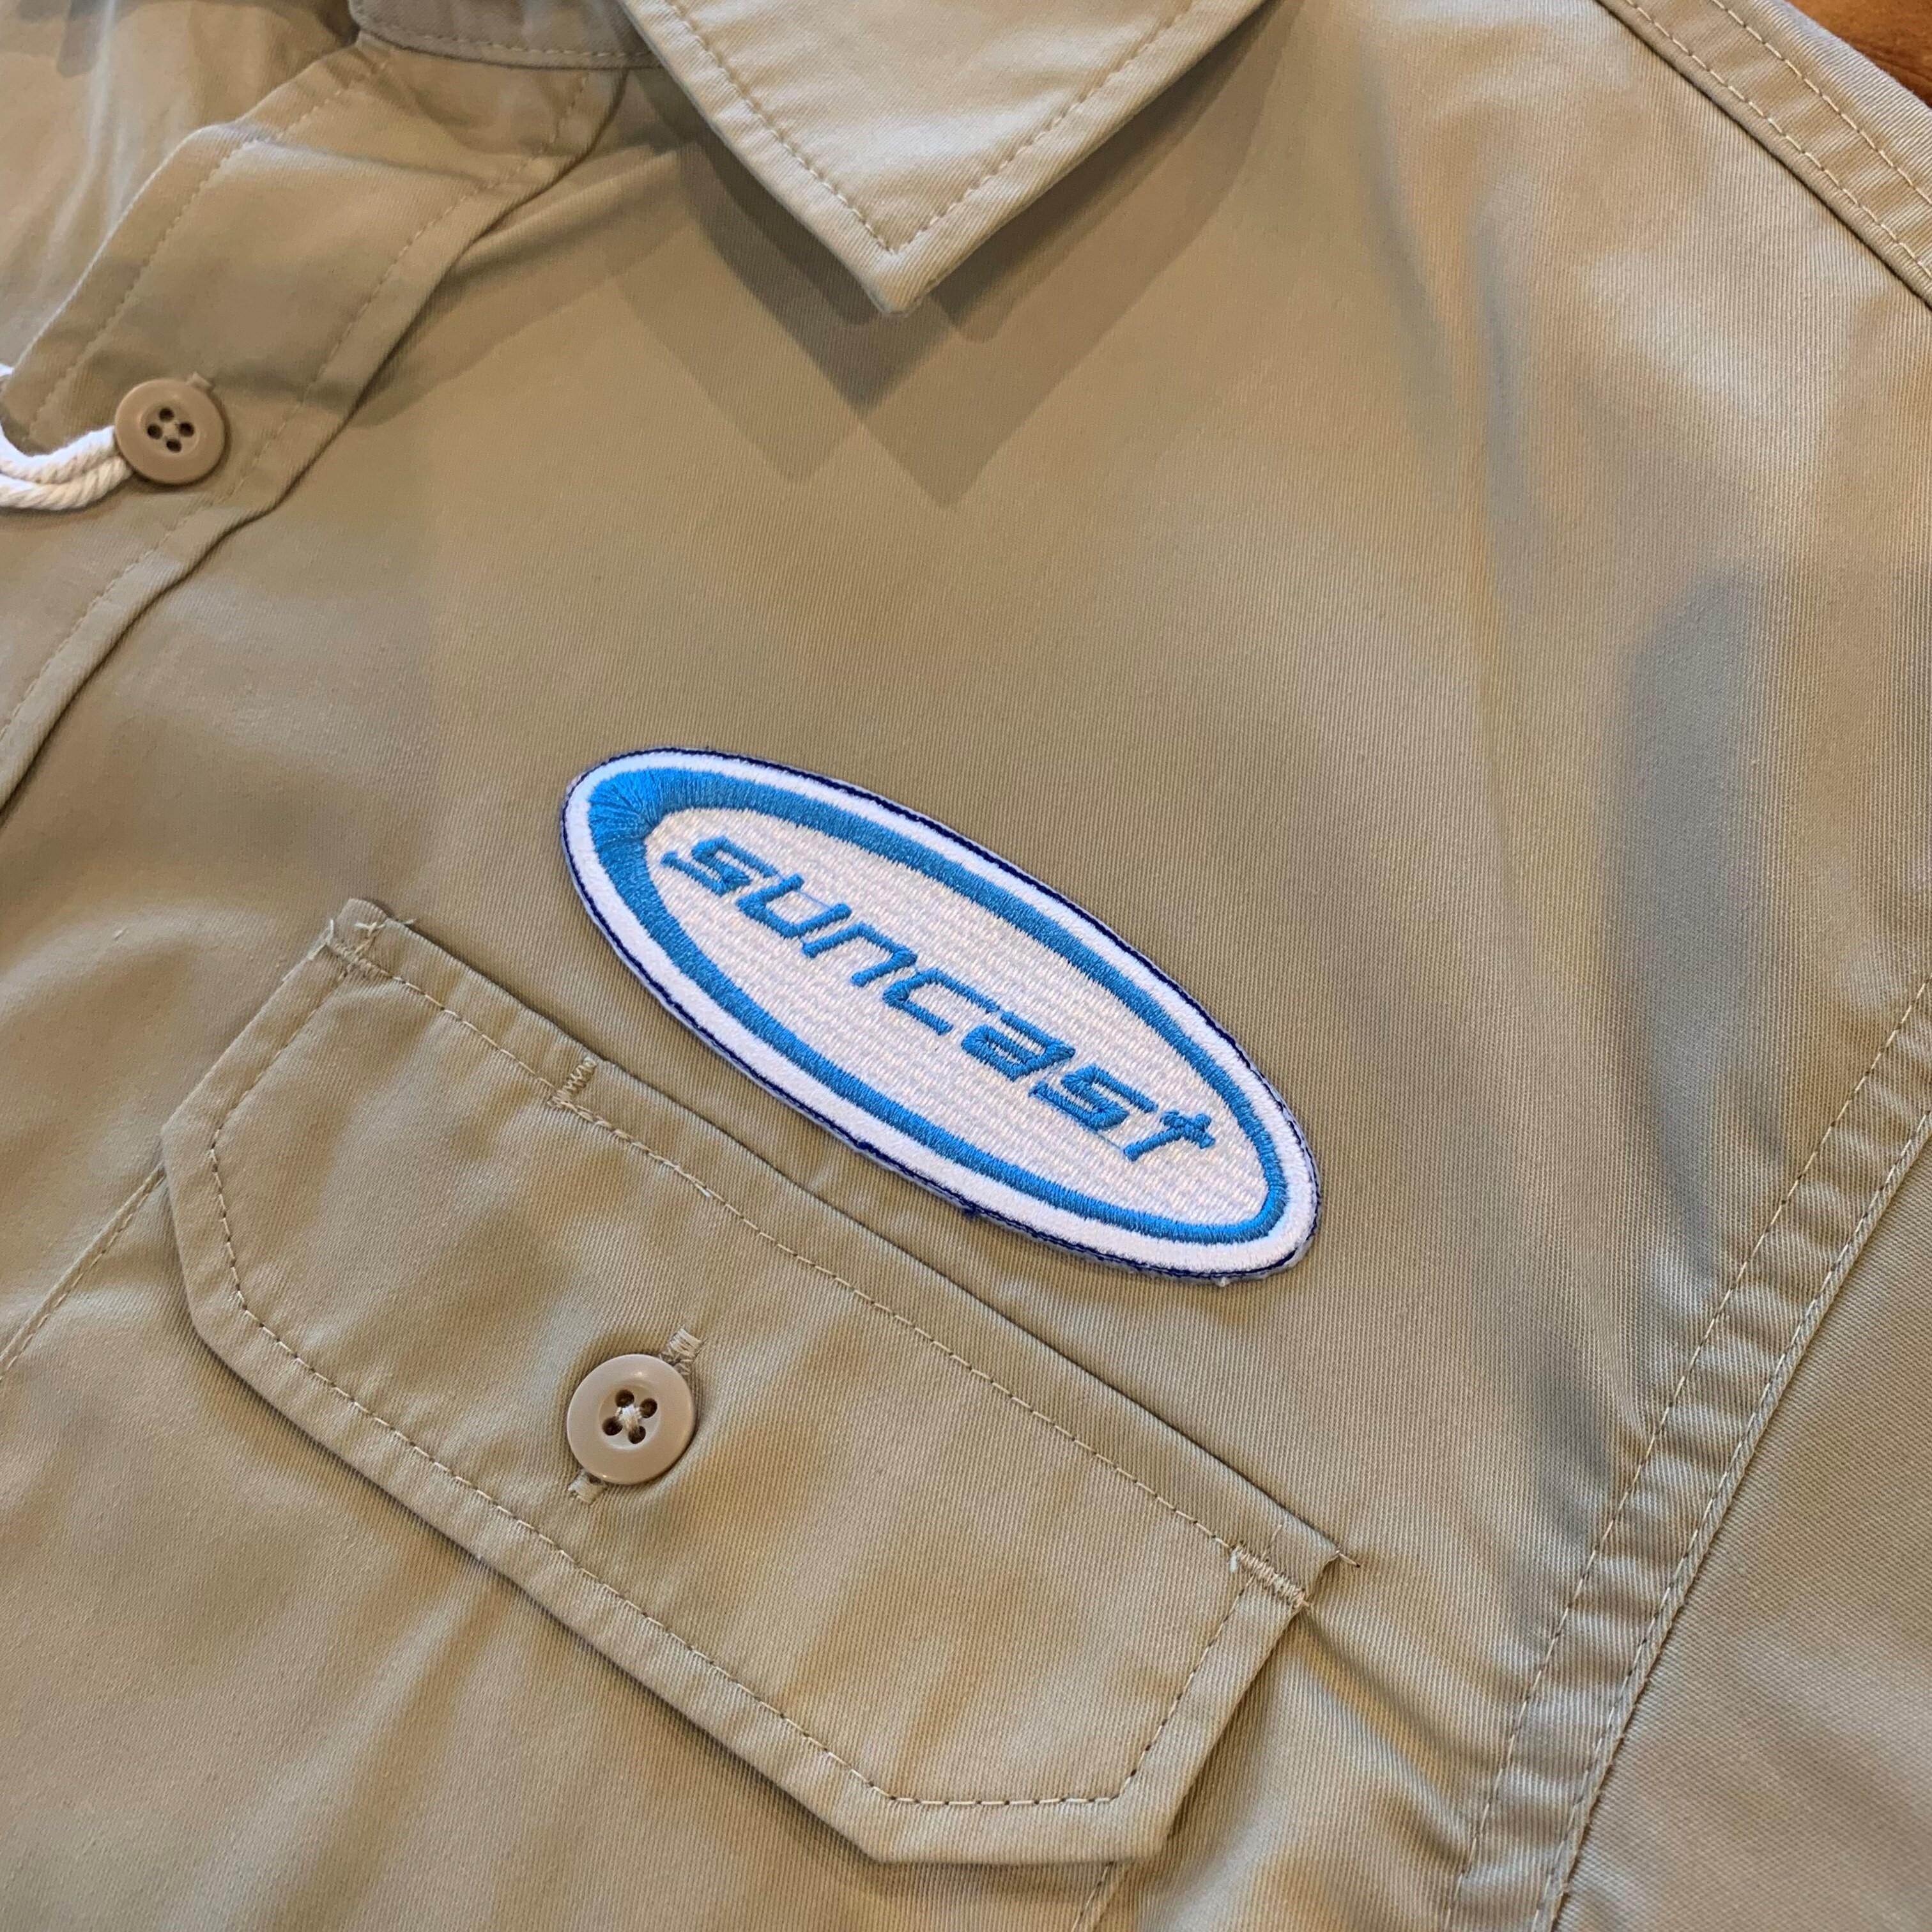 PATCHIES【ワッペン】 SUNCAST サンキャスト ワークシャツ